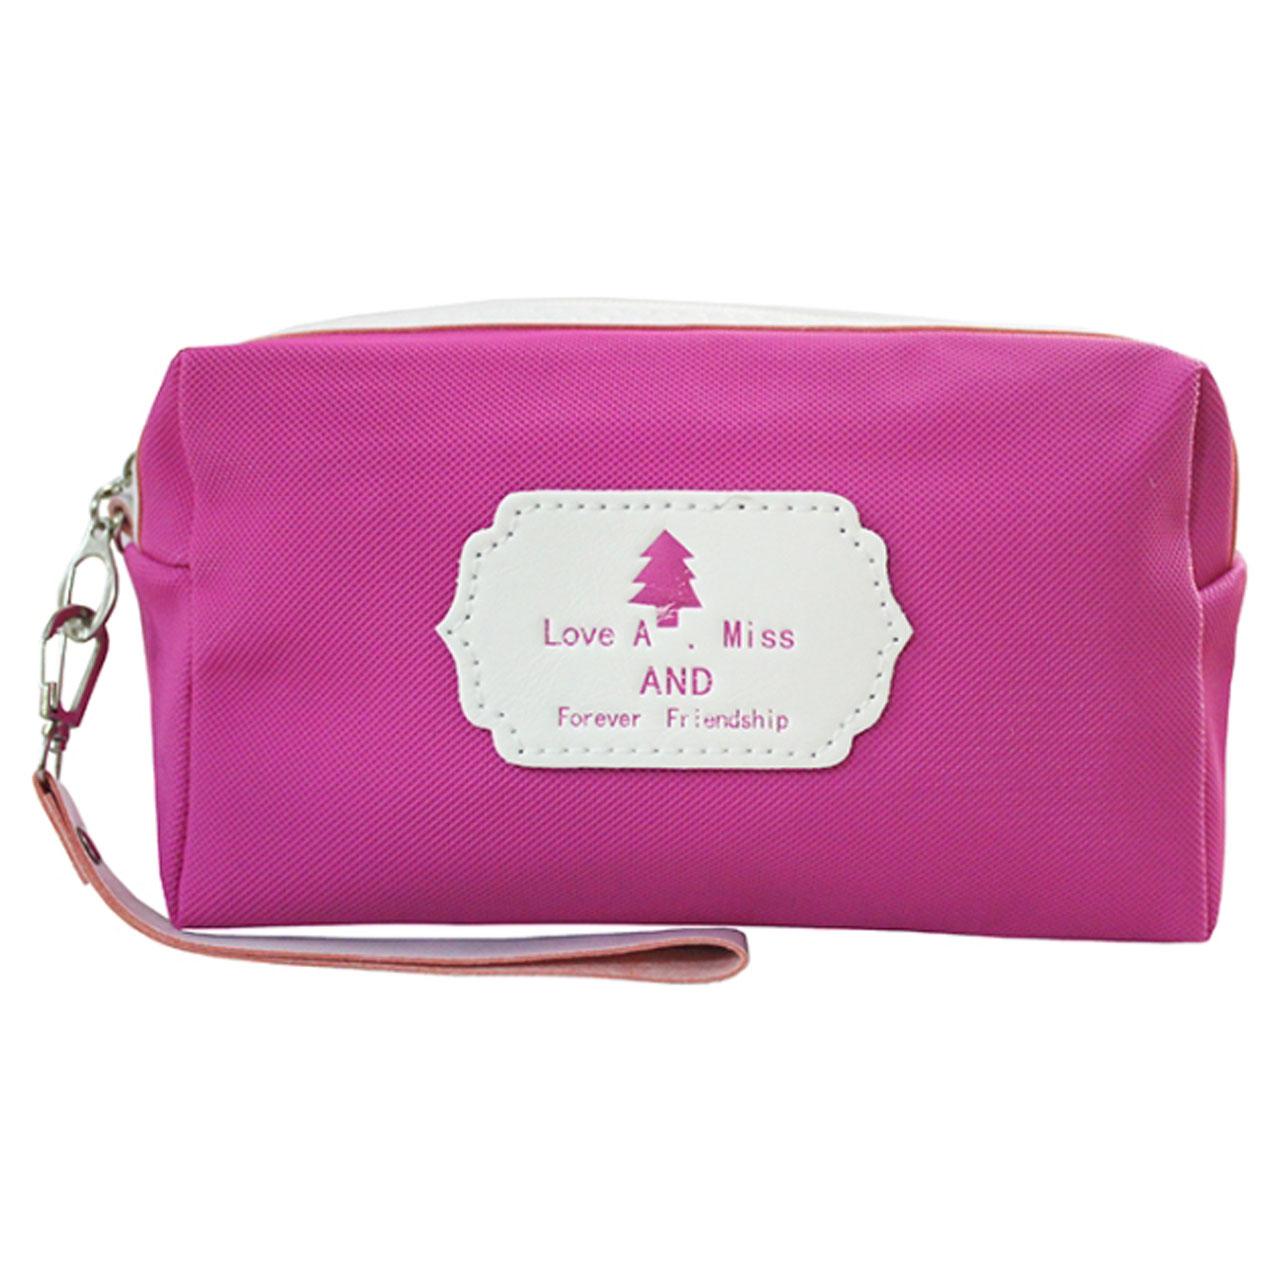 قیمت کیف لوازم آرایش مدل Lovely Miss